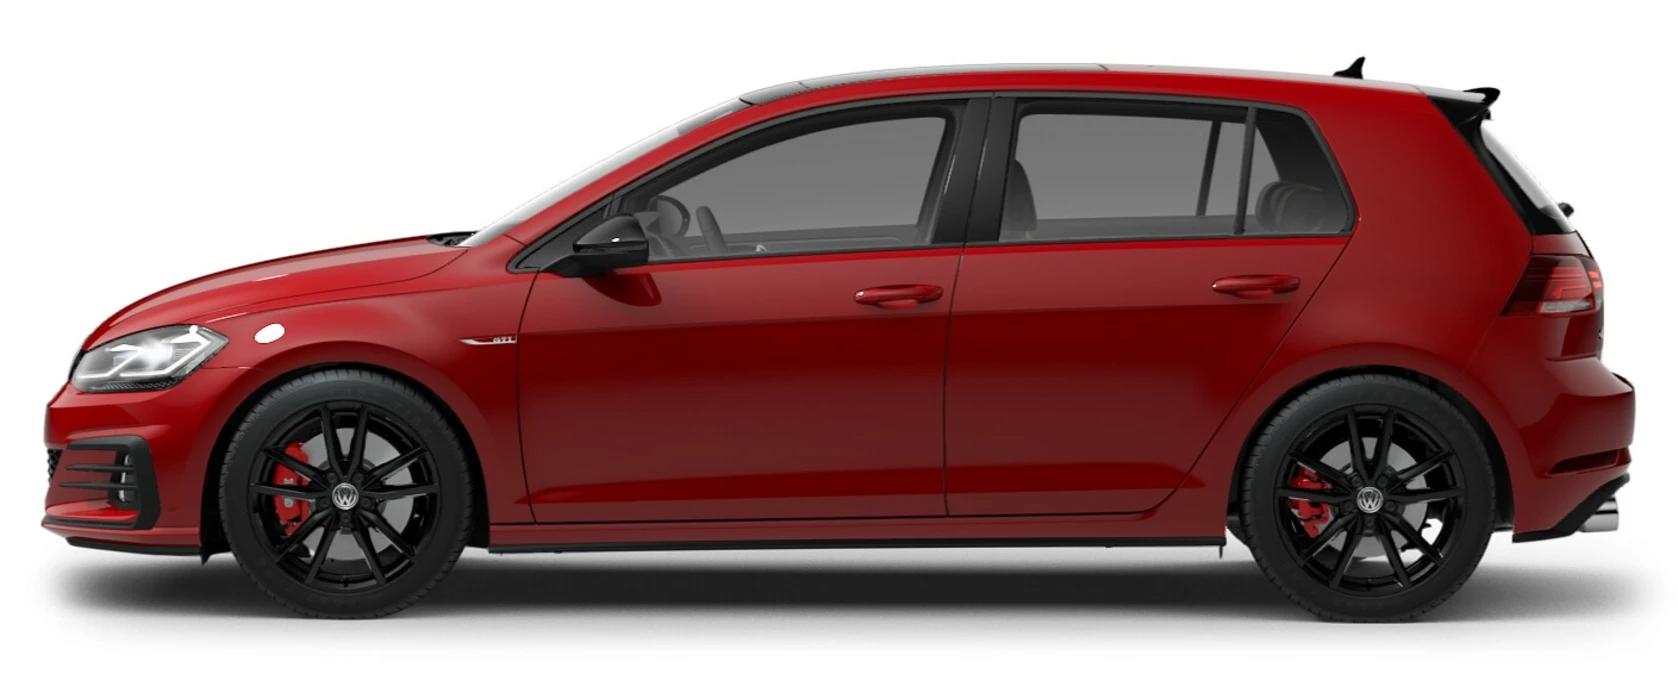 2021 Volkswagen Golf GTI Tornado Red